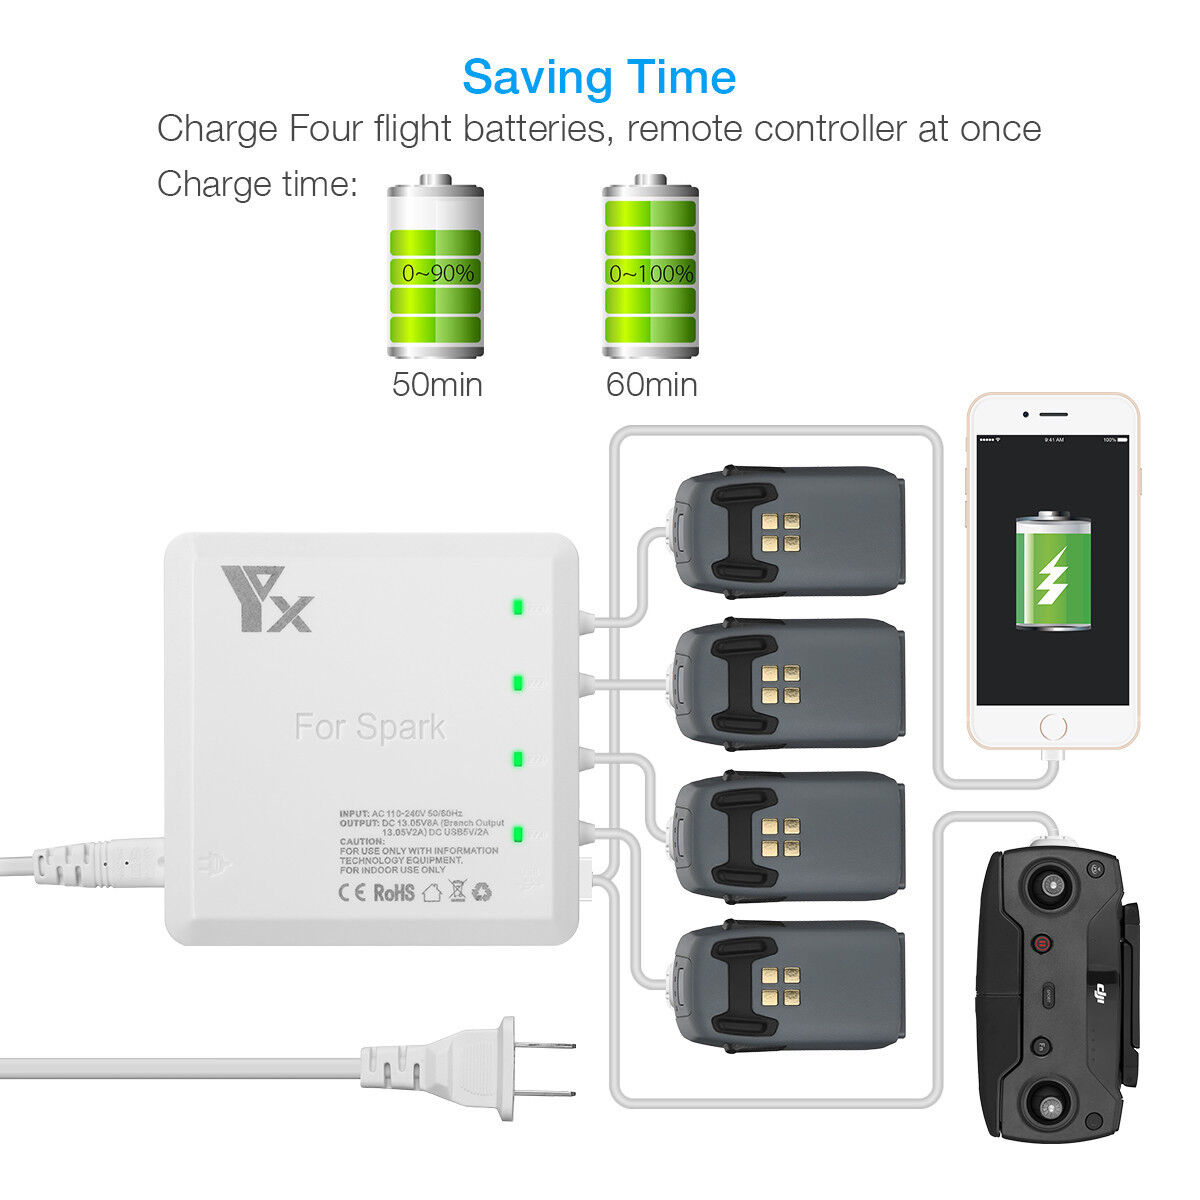 6 in 1 Rapid Intelligent Multi Batteries Charger Hub + 2 USB Ports for DJI Spark